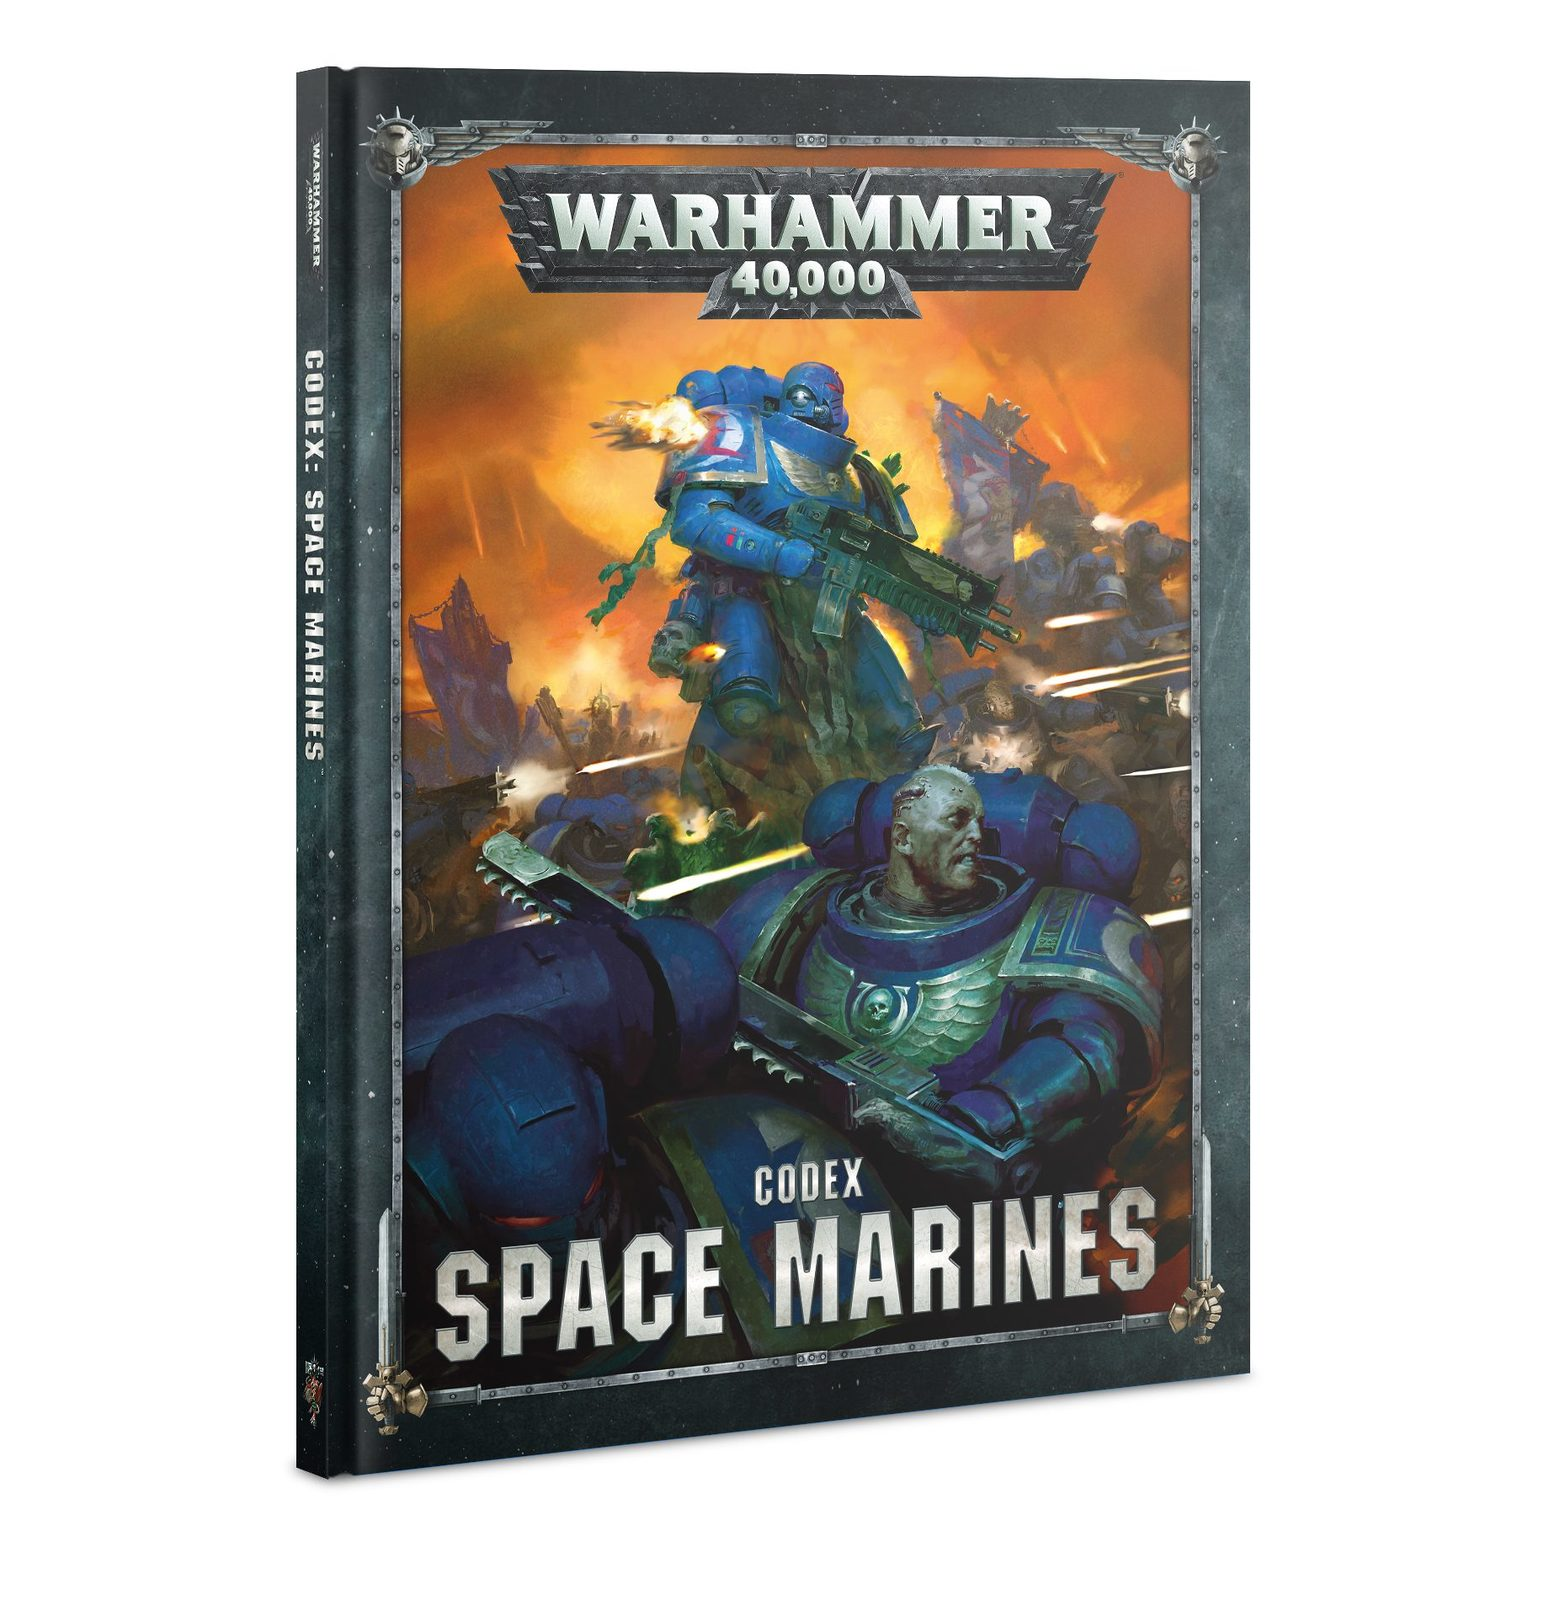 Warhammer 40,000 Codex: Space Marines image